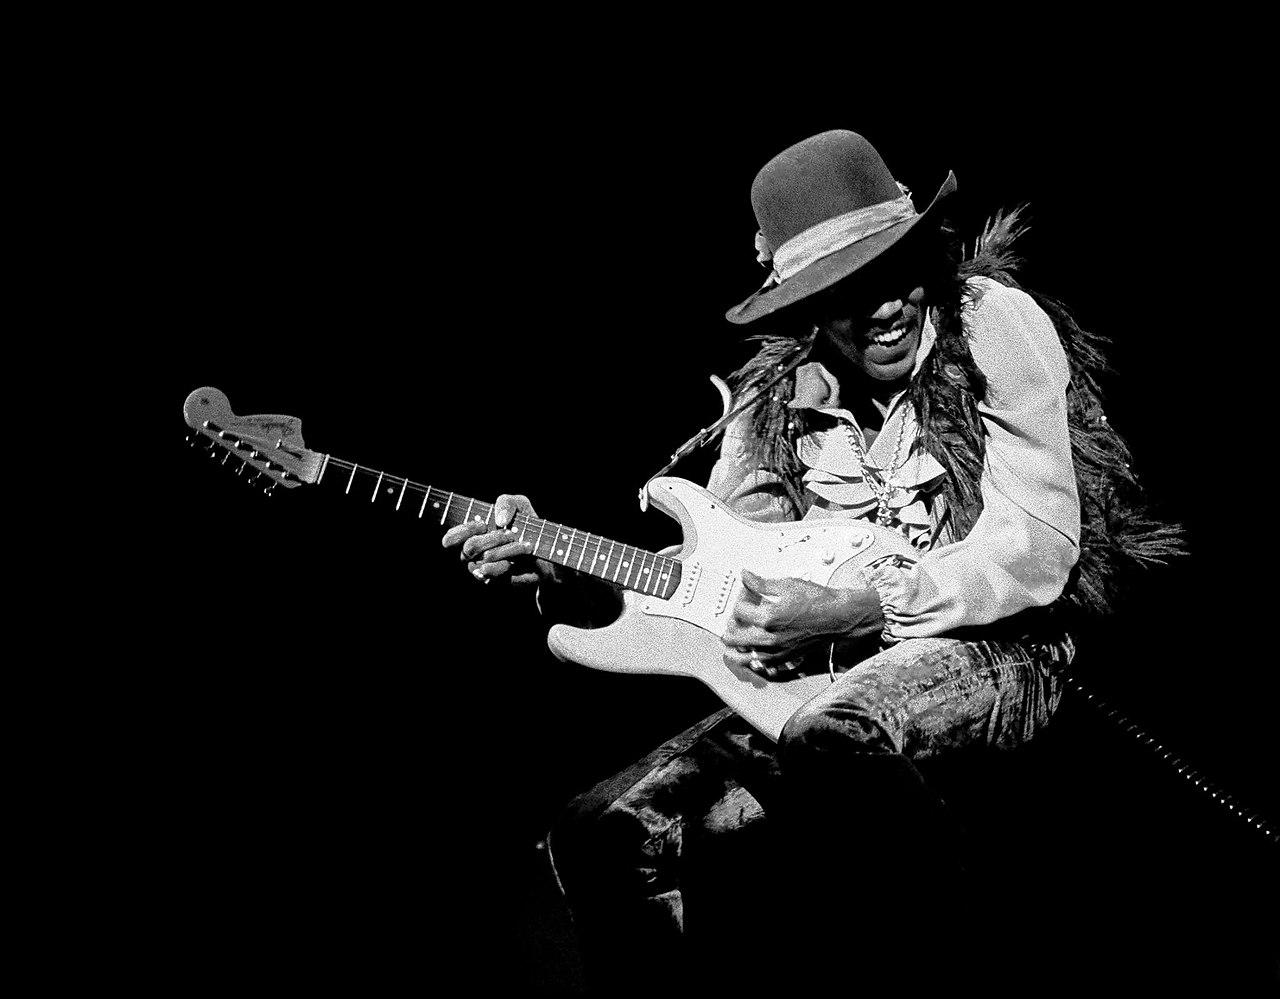 File:Banks Hendrix.jpg - Wikimedia Commons